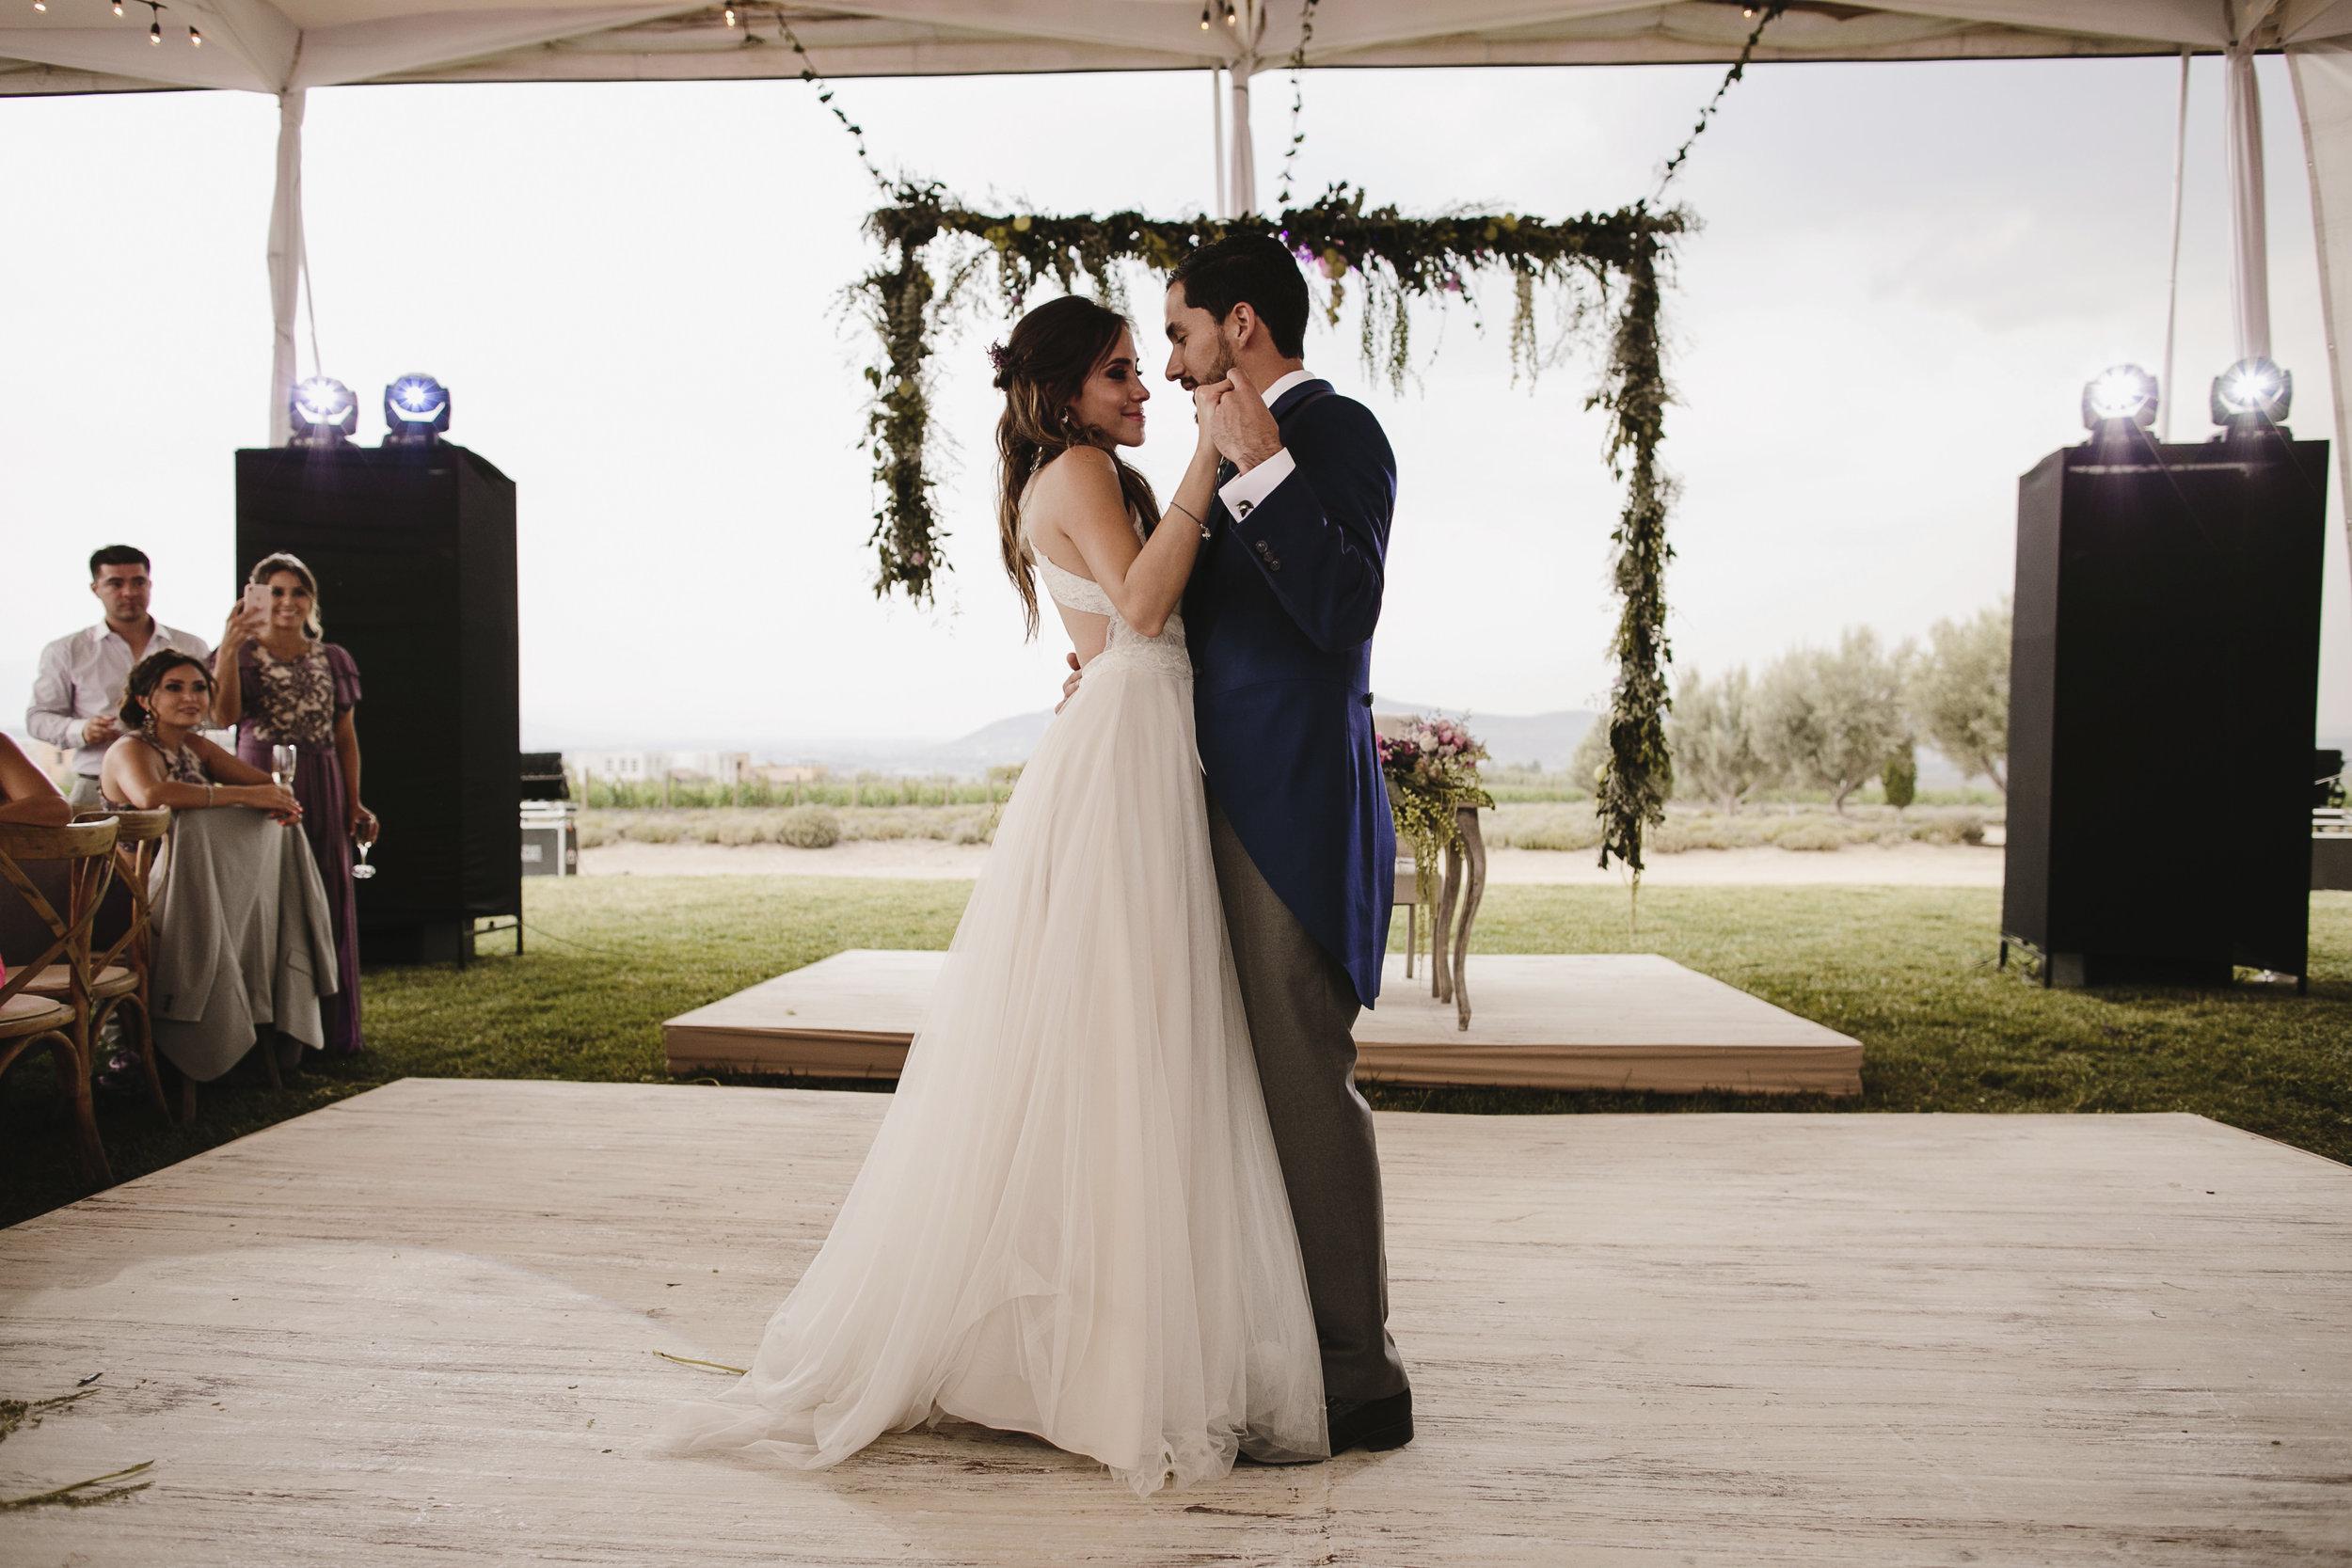 alfons_flores_destination_wedding_photography_mavi_david-1528.JPG